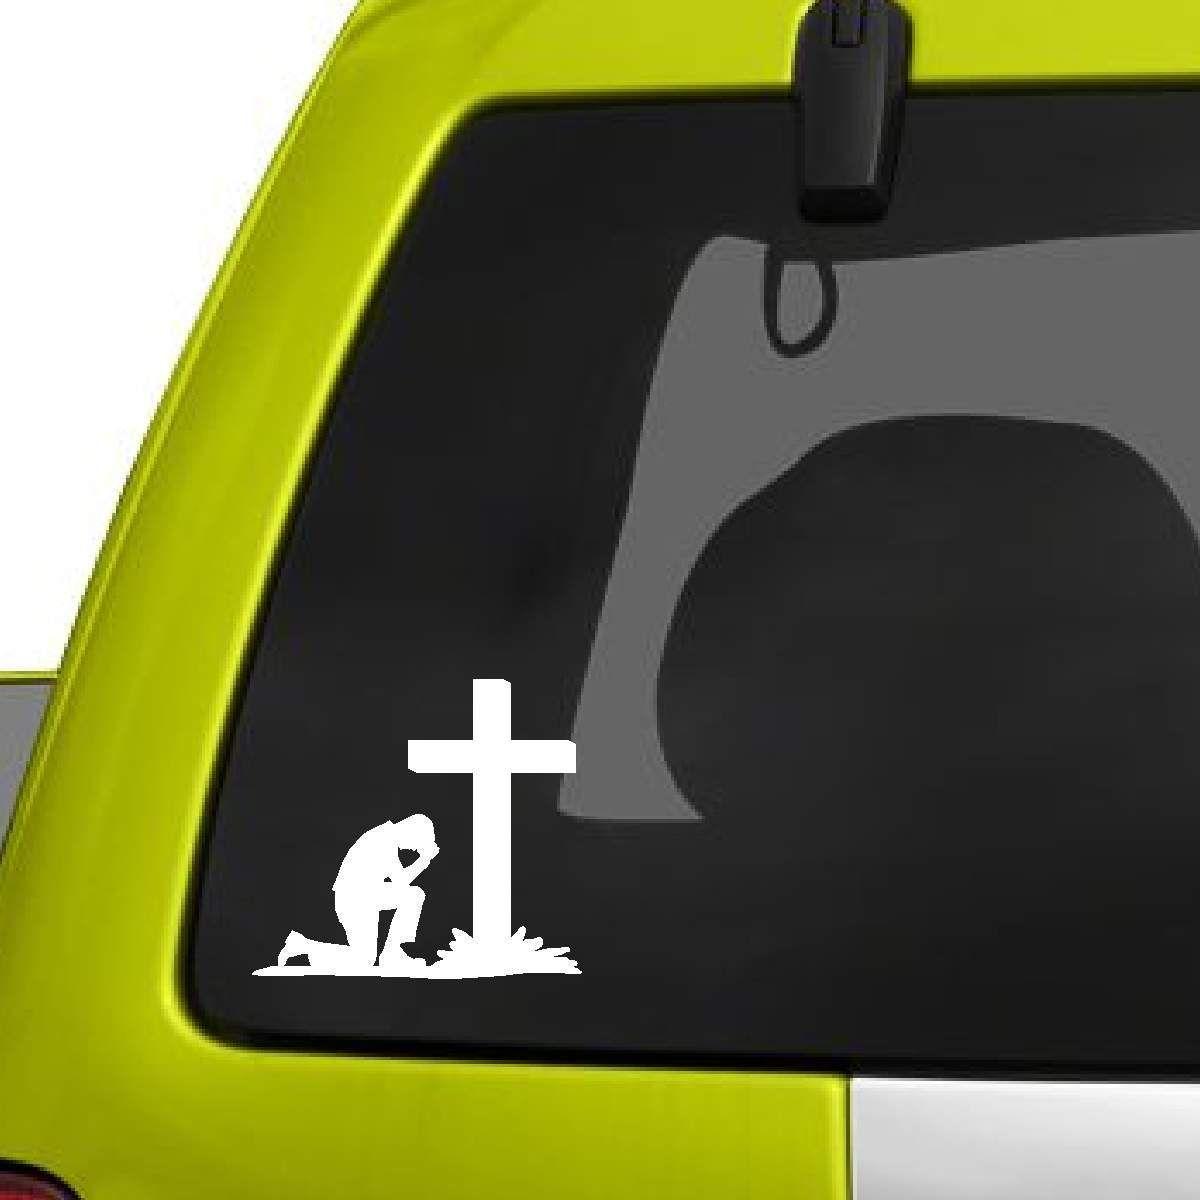 Man Praying At Cross Decal Girl Decals Truck Window Stickers Decal Design [ 1200 x 1200 Pixel ]